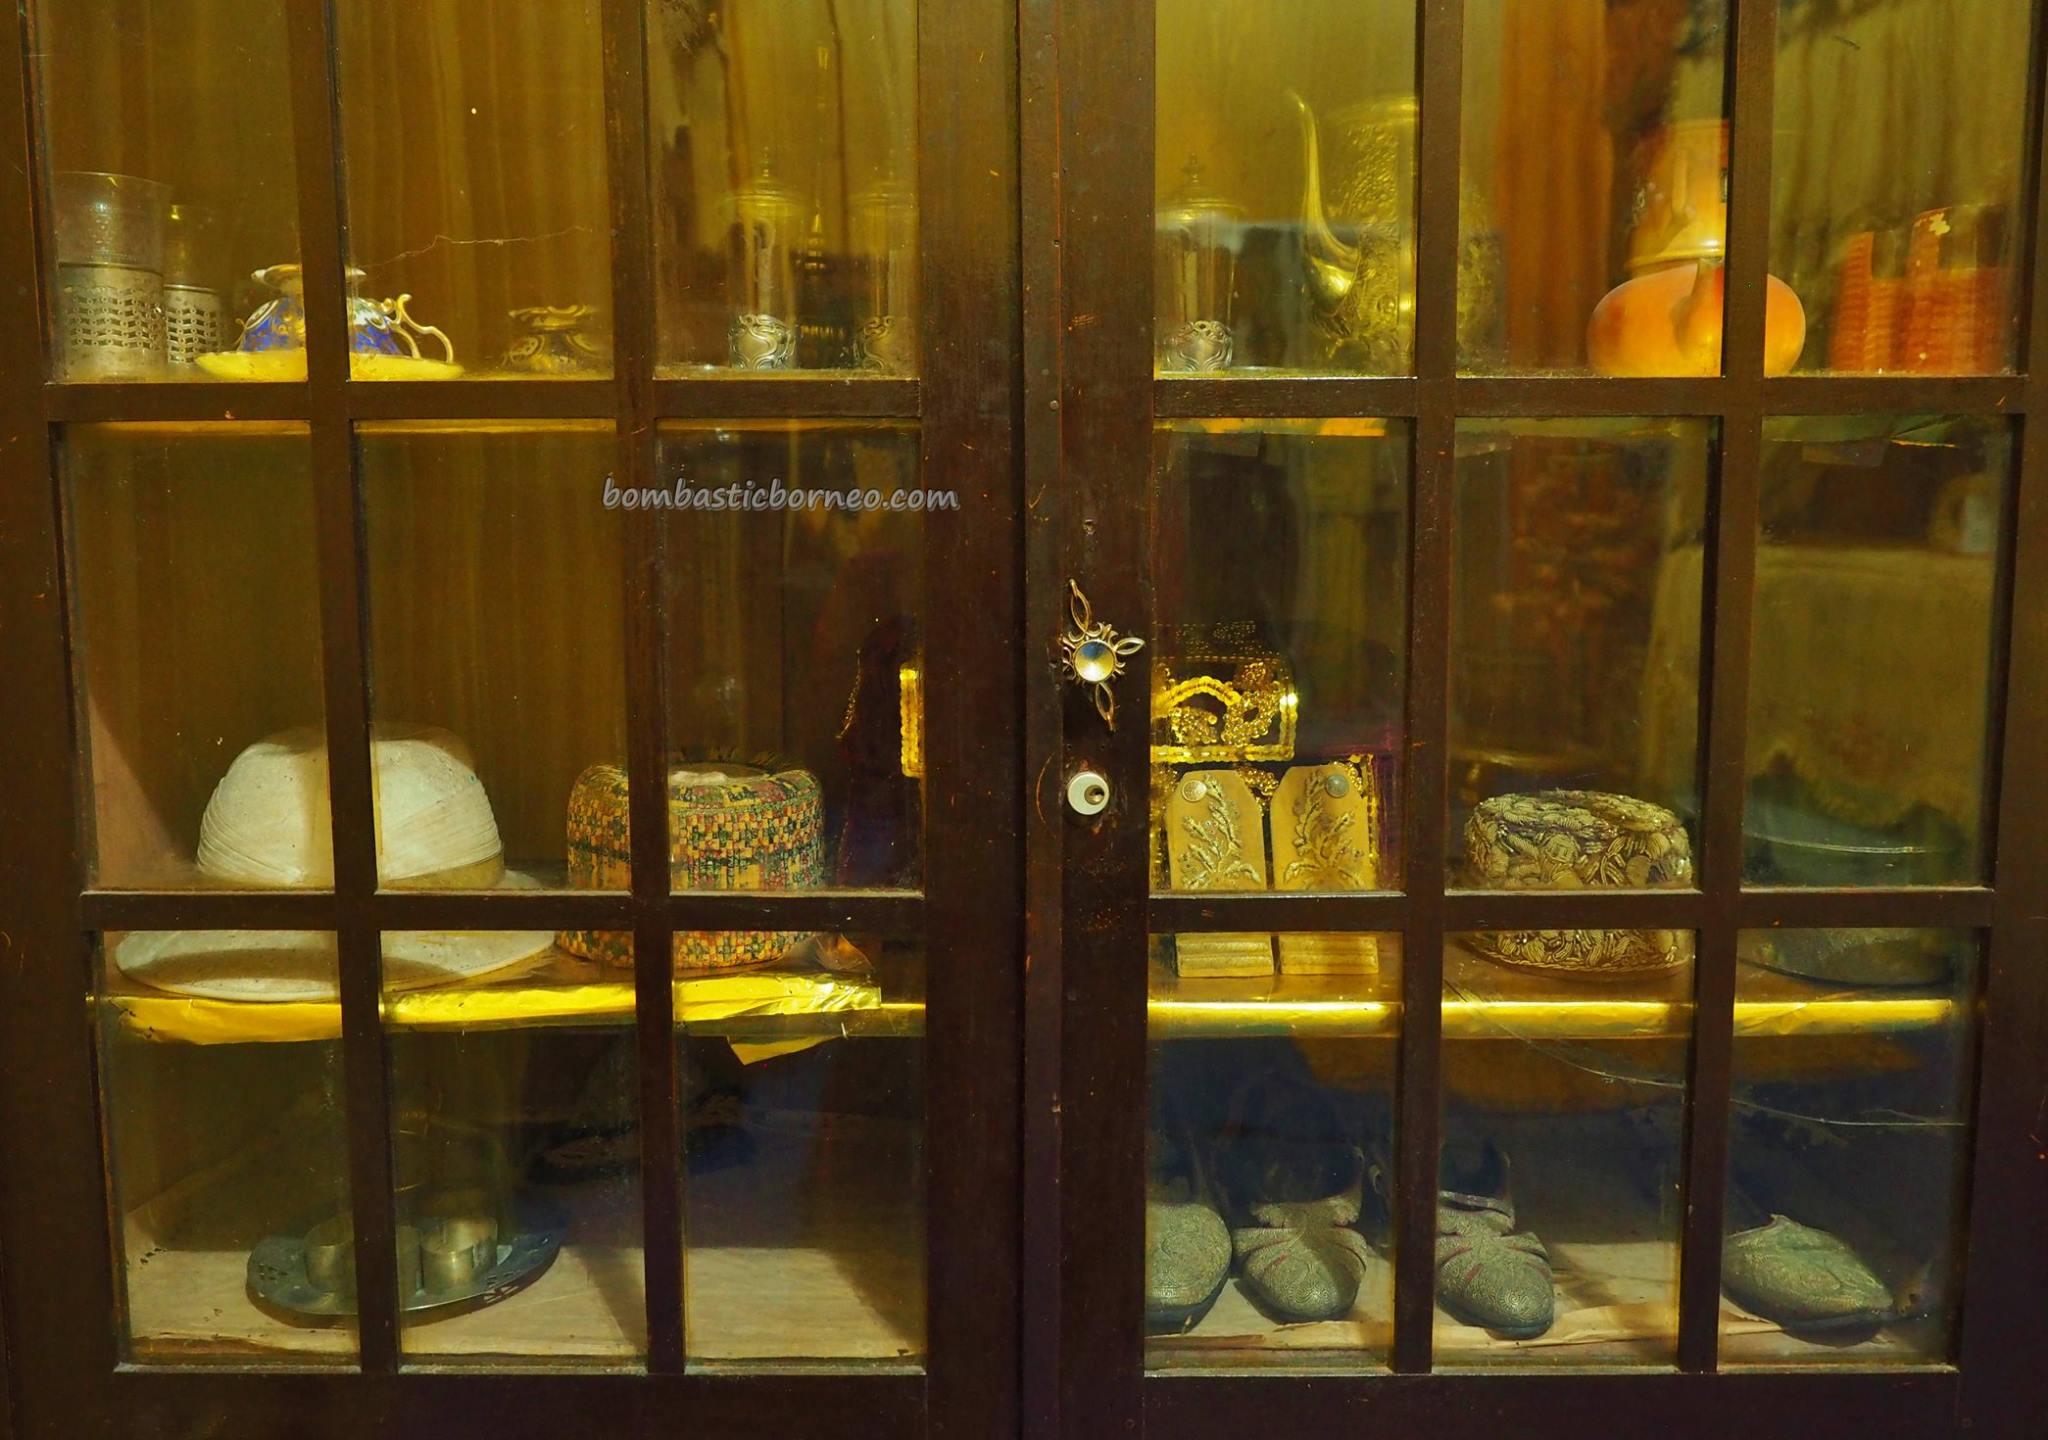 Palace, Istana Kerajaan, Kesultanan Melayu, history, traditional, backpackers, Dayak Melayik, Borneo, West Kalimantan, museum, Obyek wisata, travel guide, crossborder, 印尼西加里曼丹, 三发皇宮,